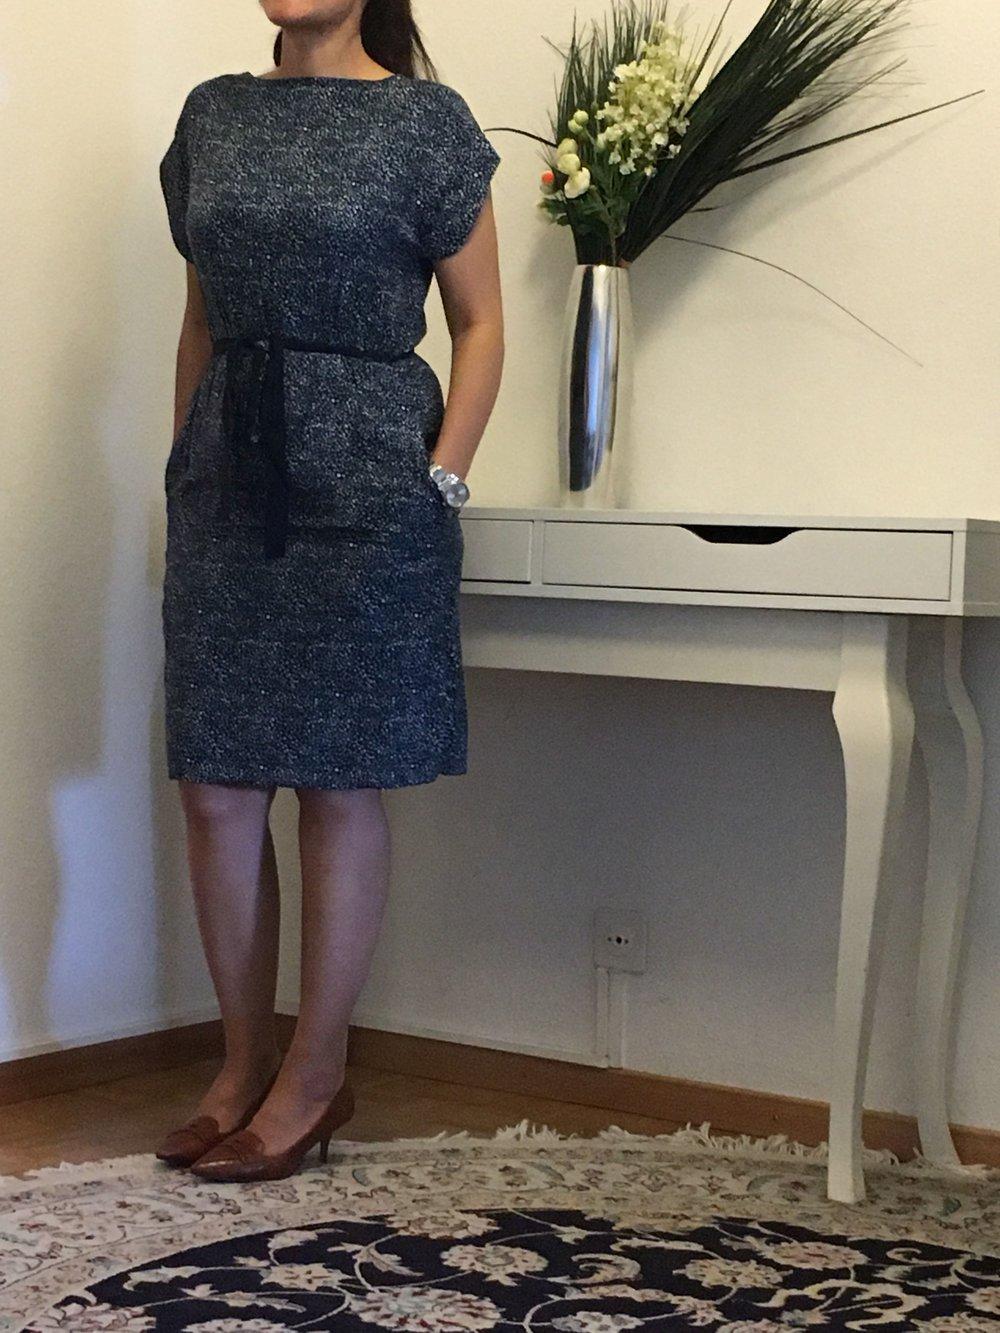 Zara - Sommer/Party Kleid Midi :: Kleiderkorb.de